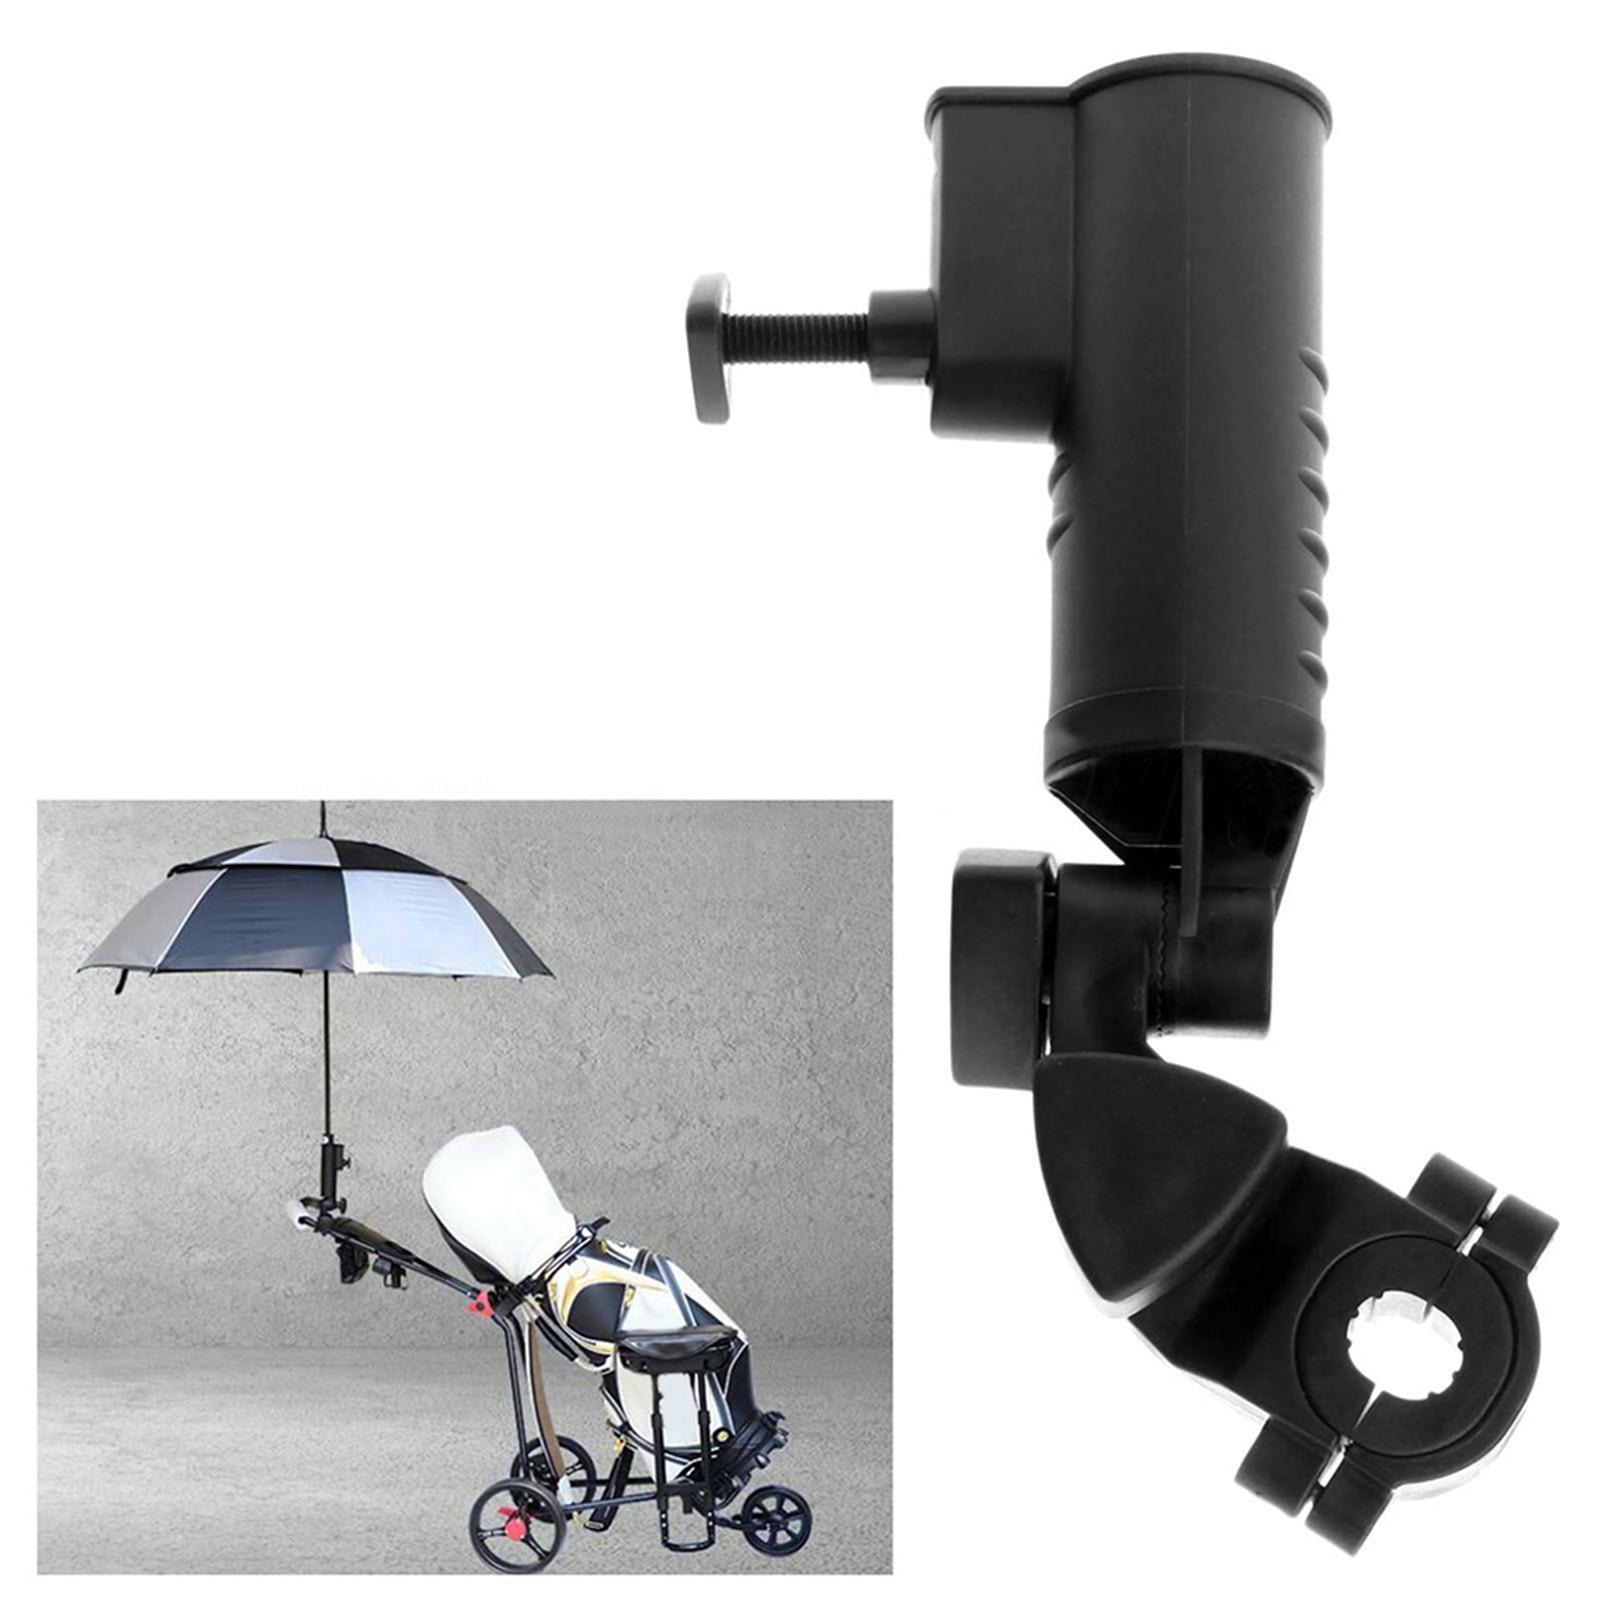 Golf Cart Umbrella holder Umbrella Stand Rotatable Knob Adjustable Universal Umbrella Holder Fit for Golf Cart